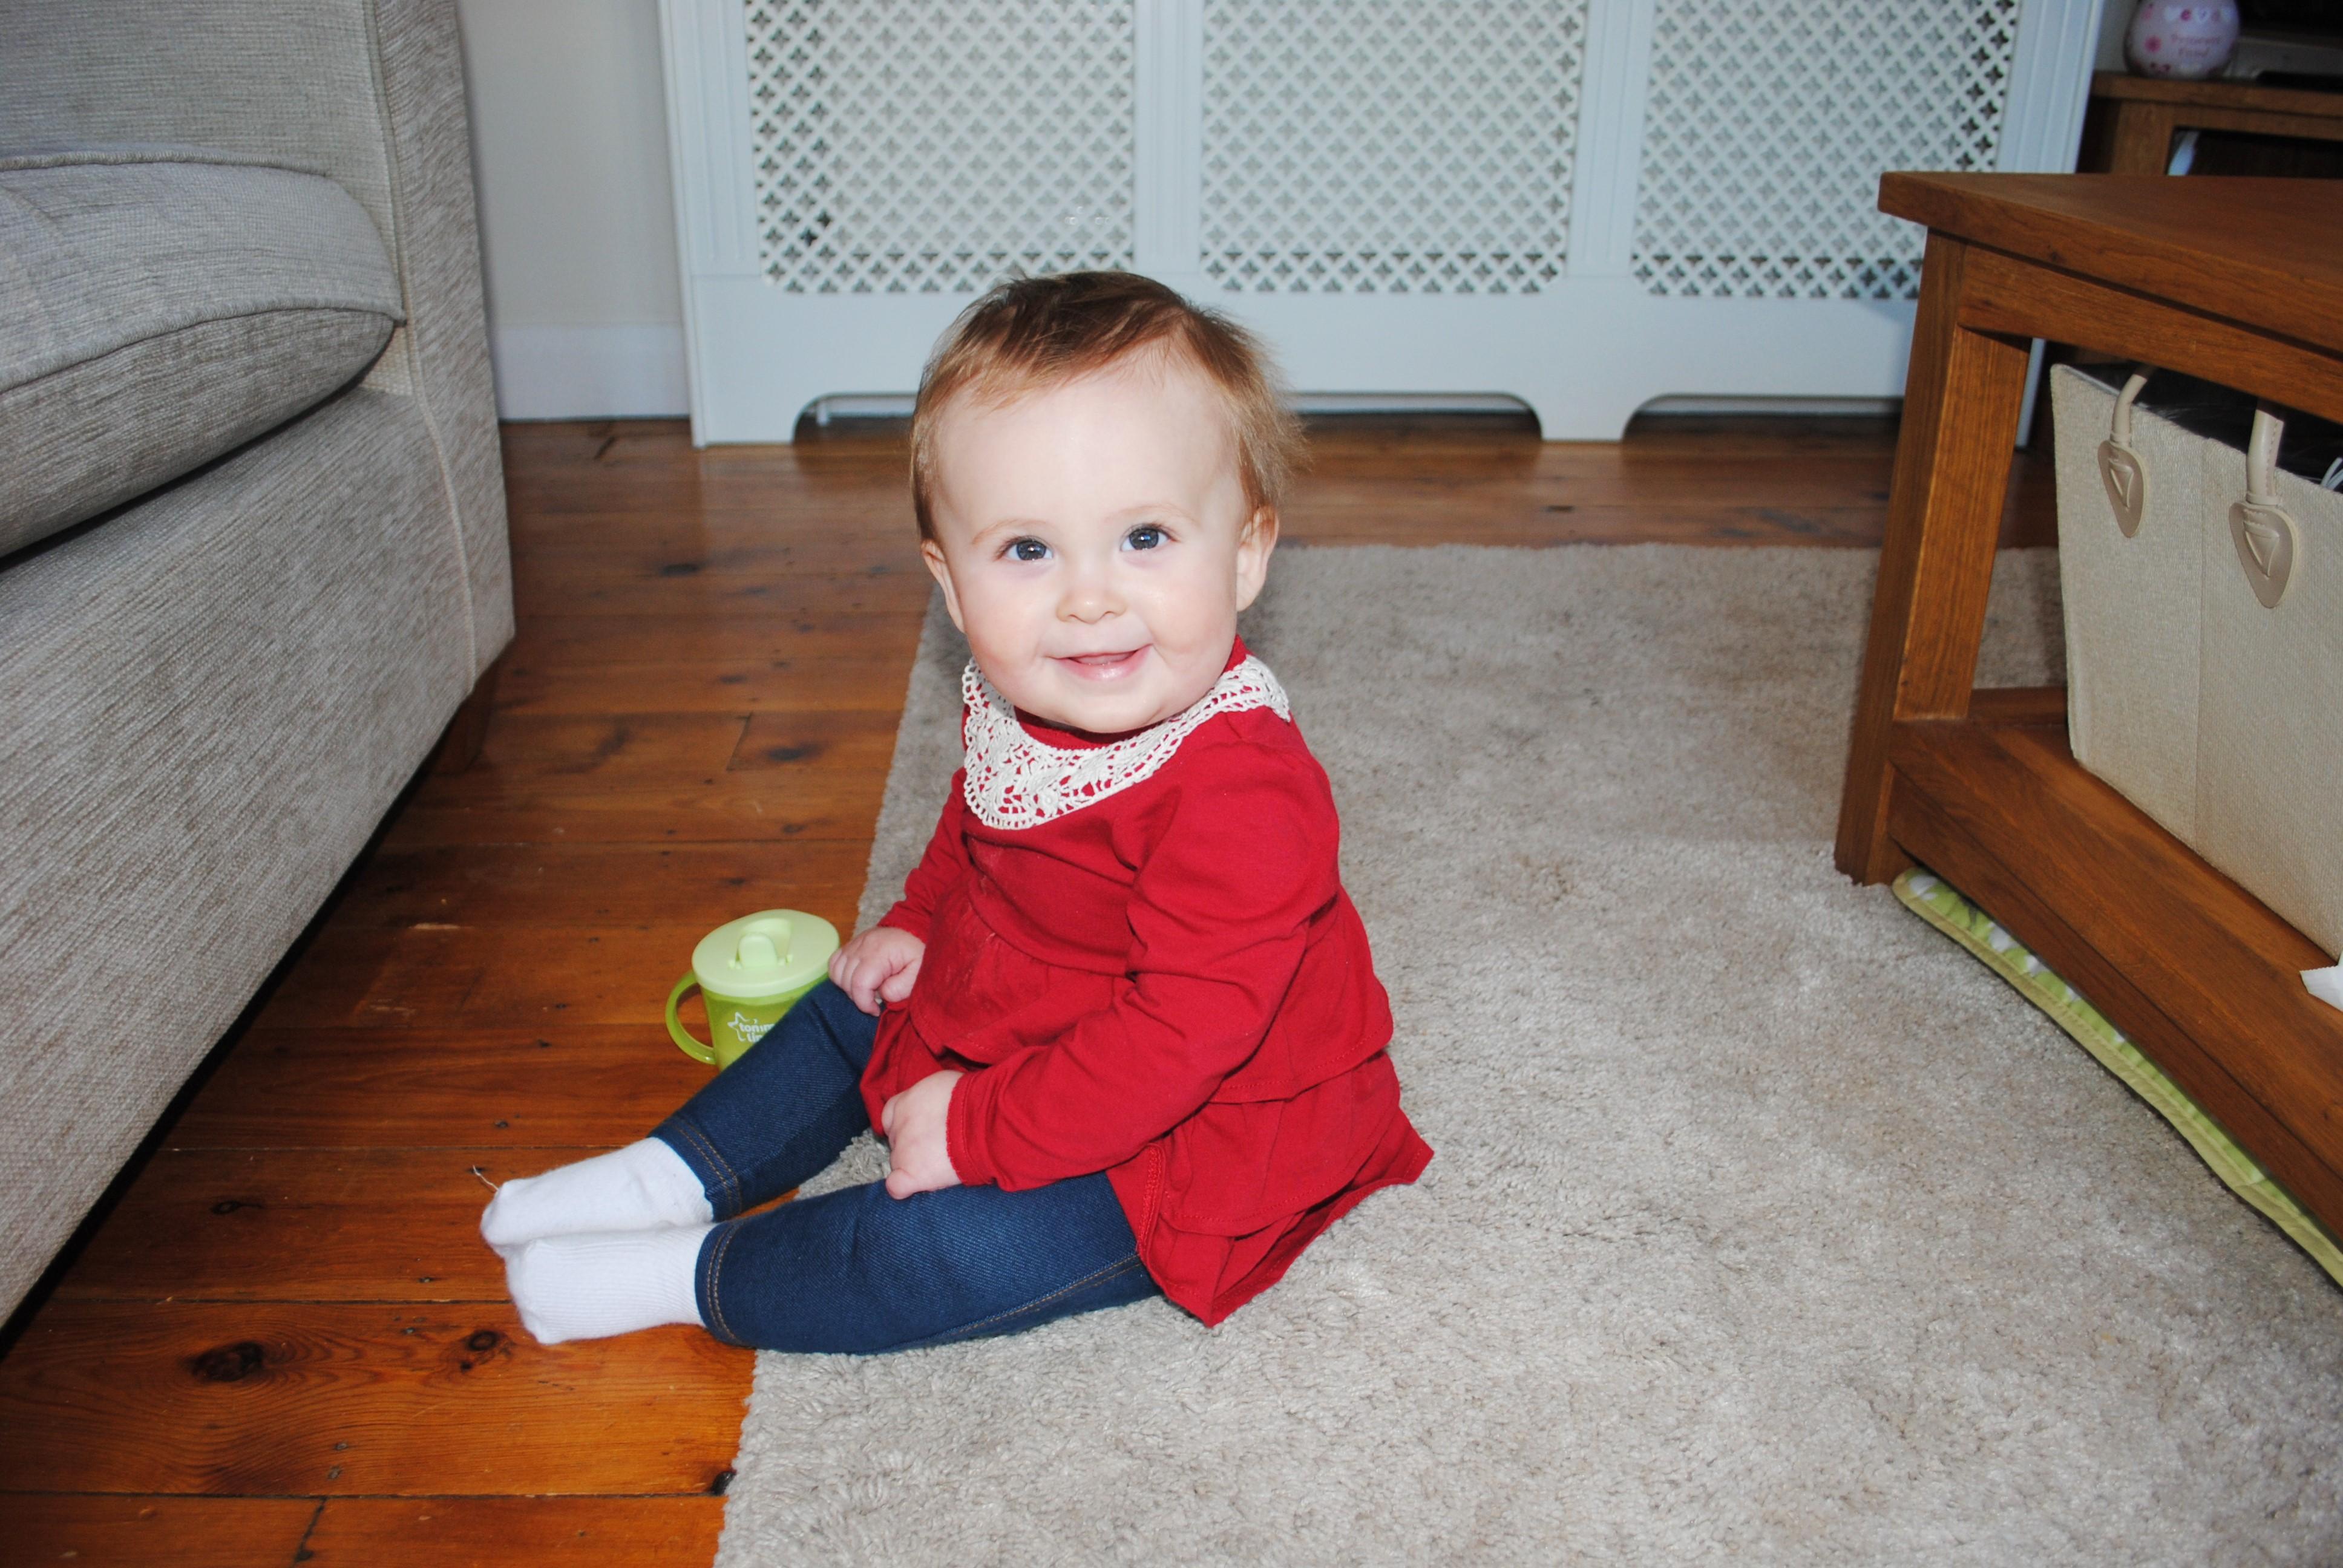 eva drinking milk at home 10 months old